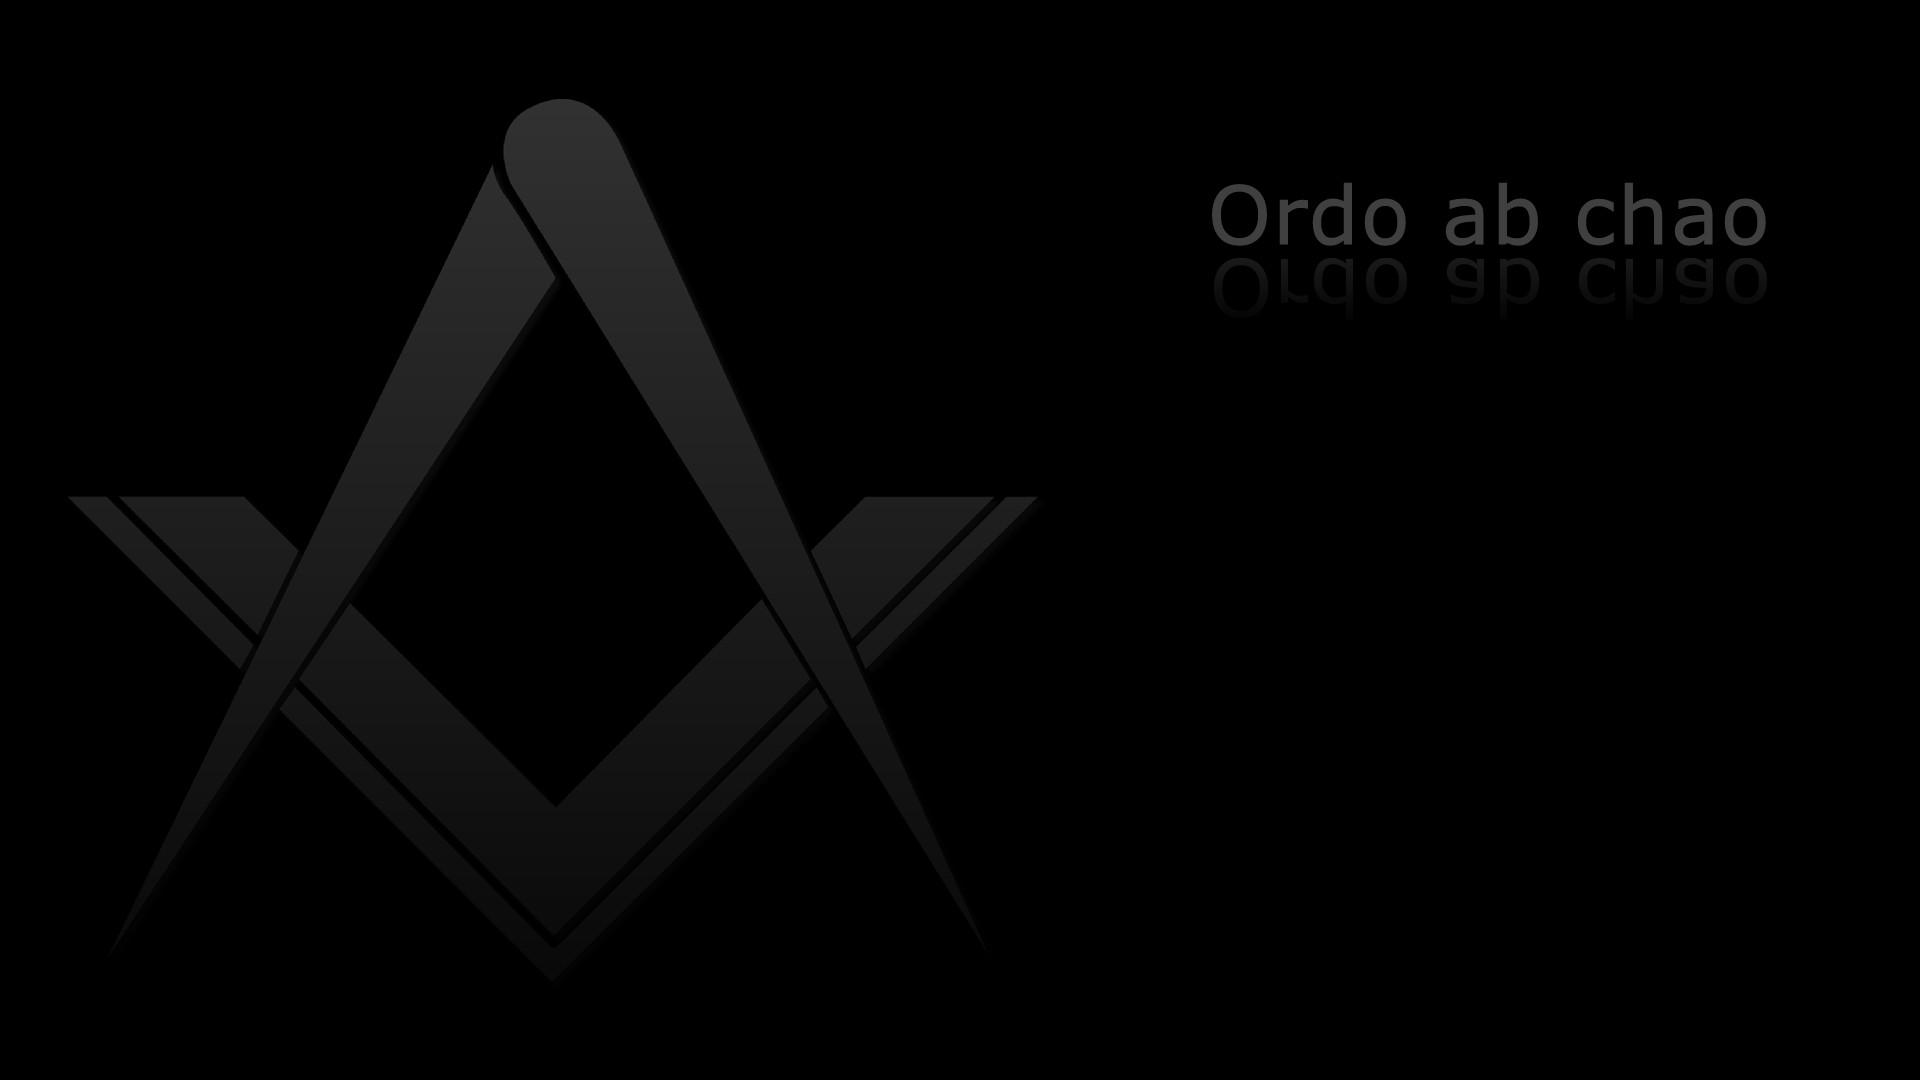 Freemason Wallpaper at FindFreeGraphics. Use our Freemason Background .